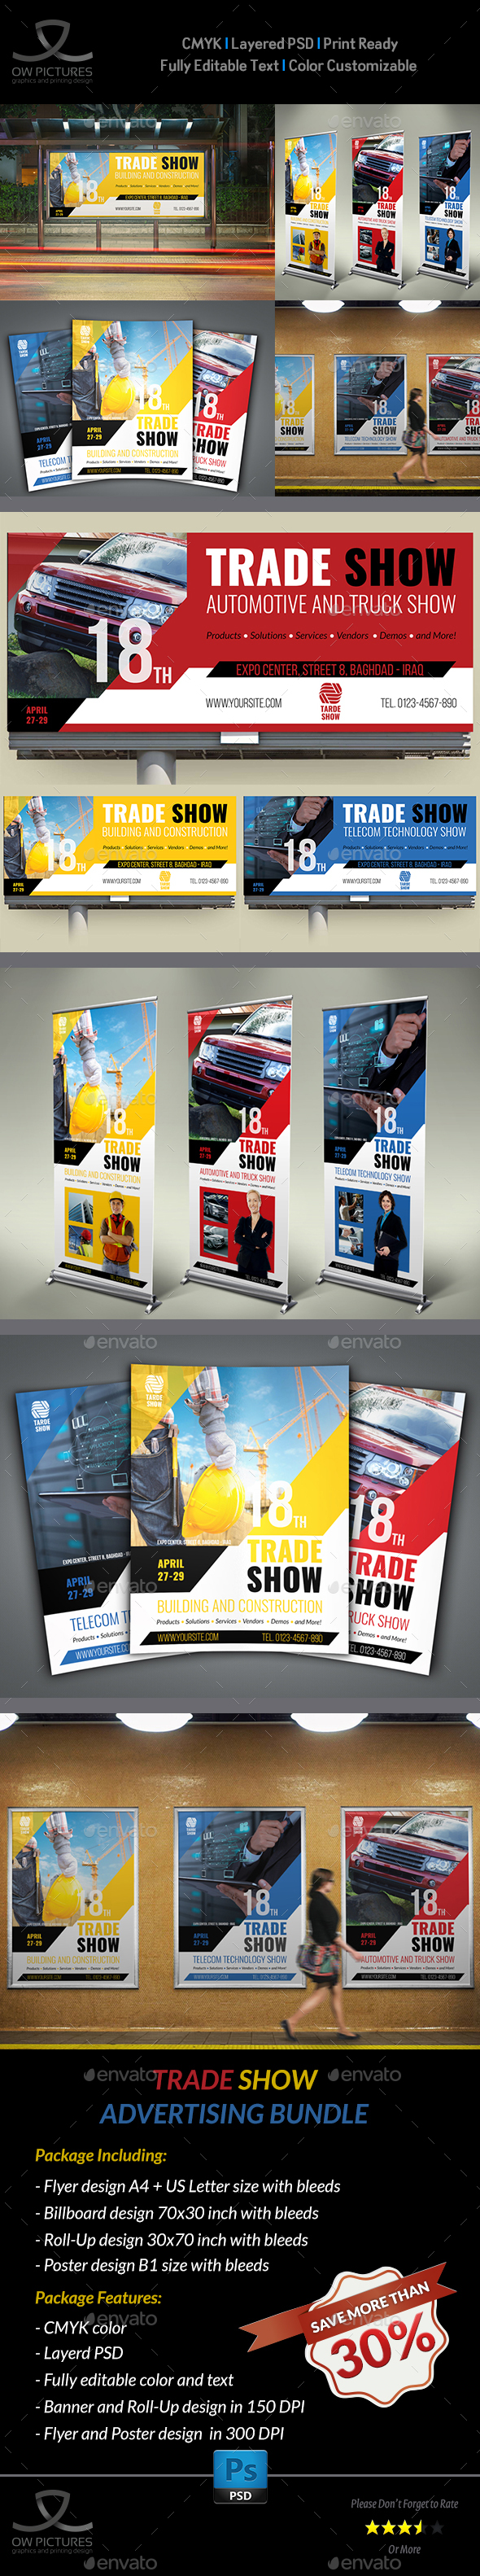 Trade Show Advertising Bundle - Signage Print Templates